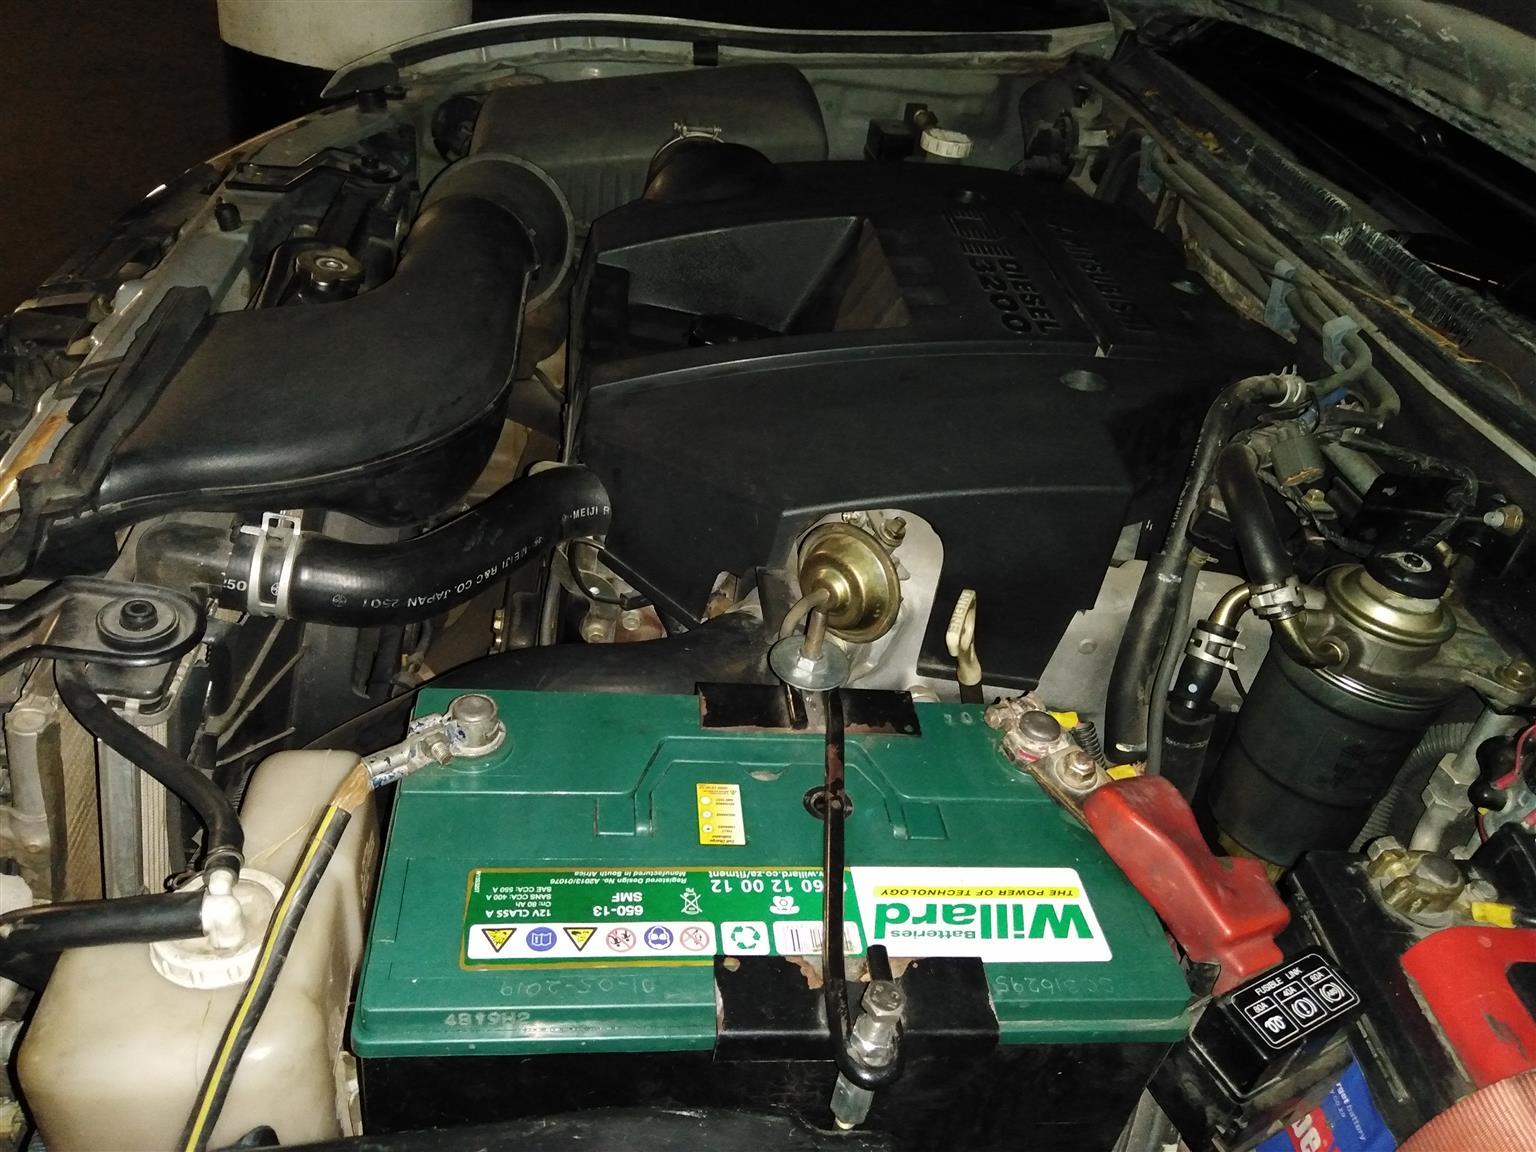 2001 Mitsubishi Pajero 5 door 3.2DI D GLS